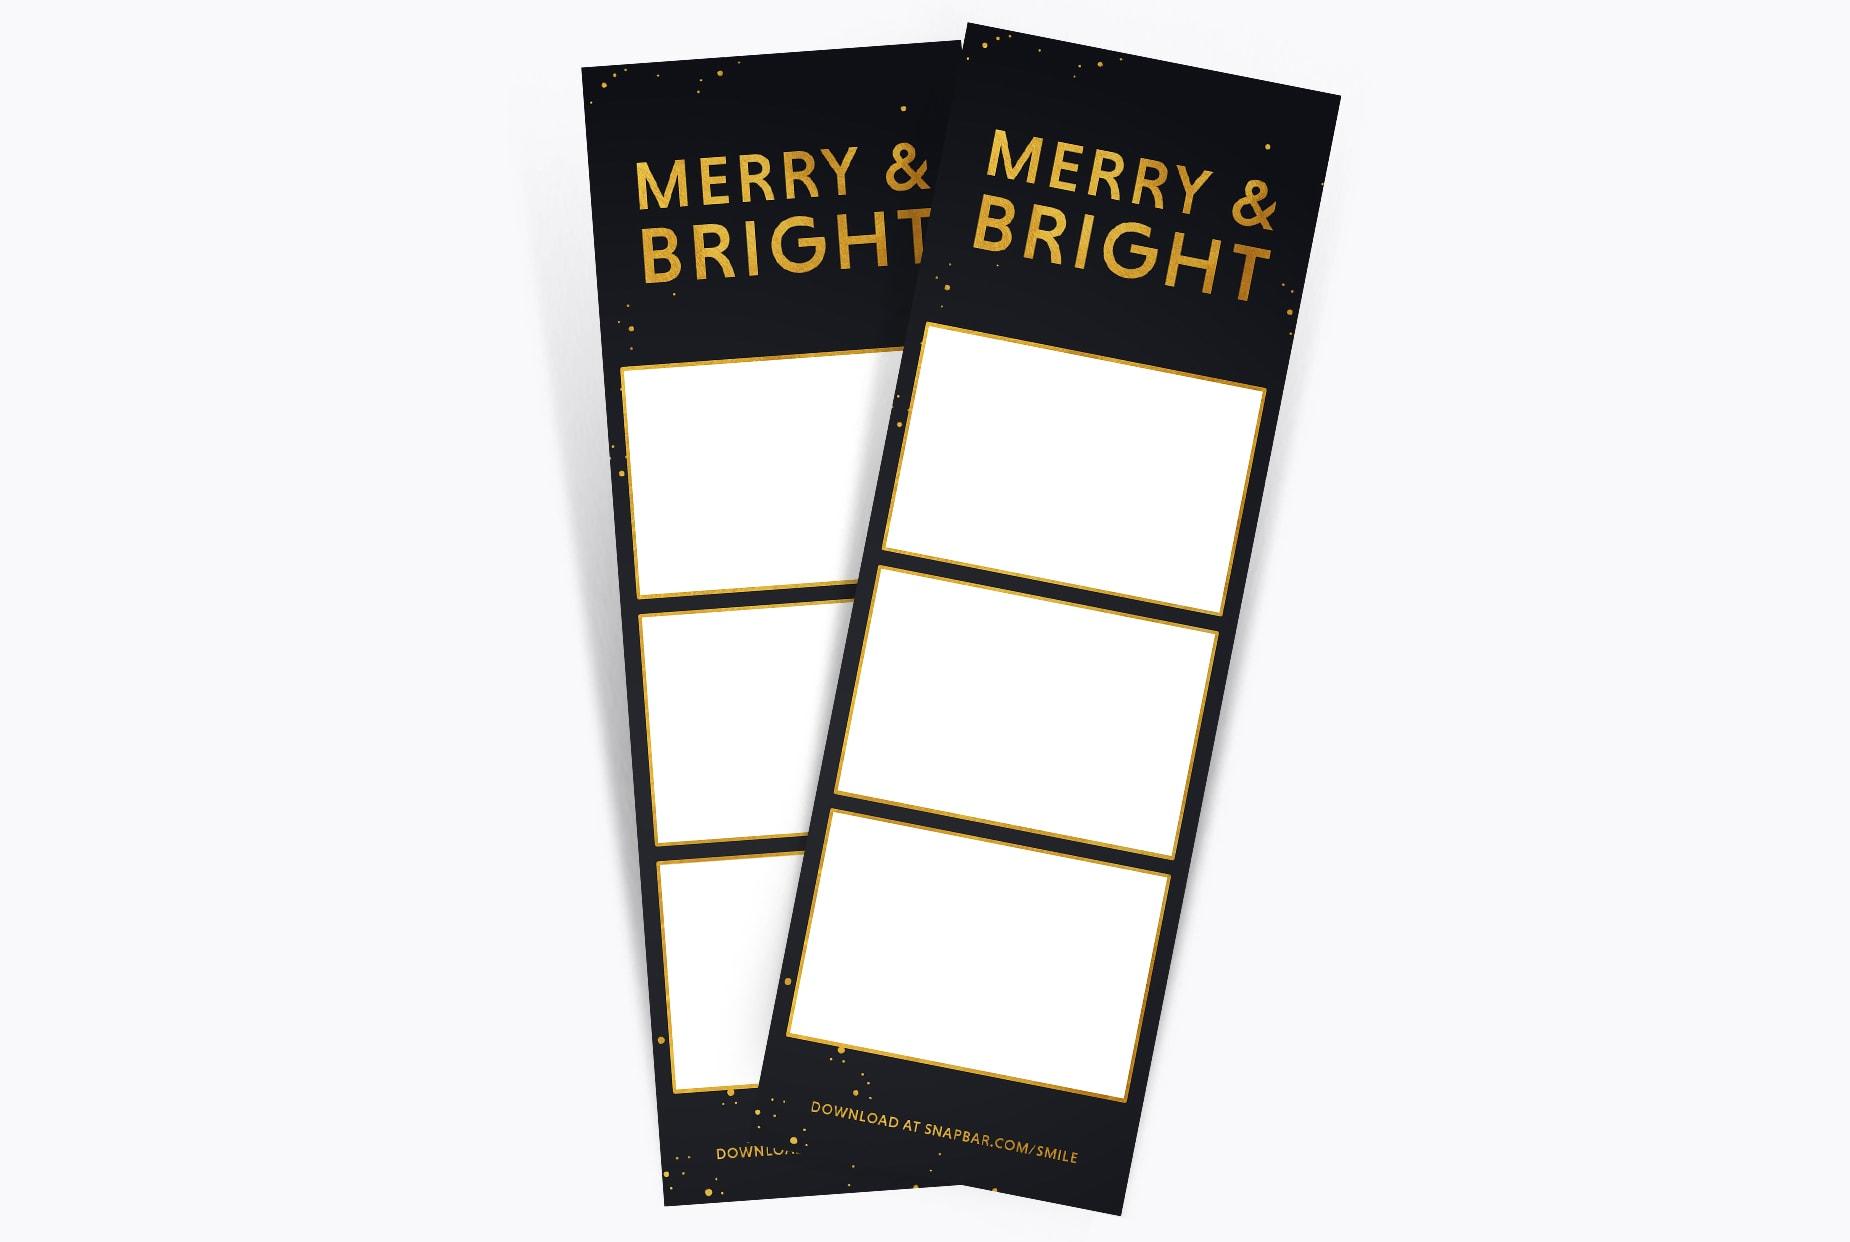 Merry &Bright